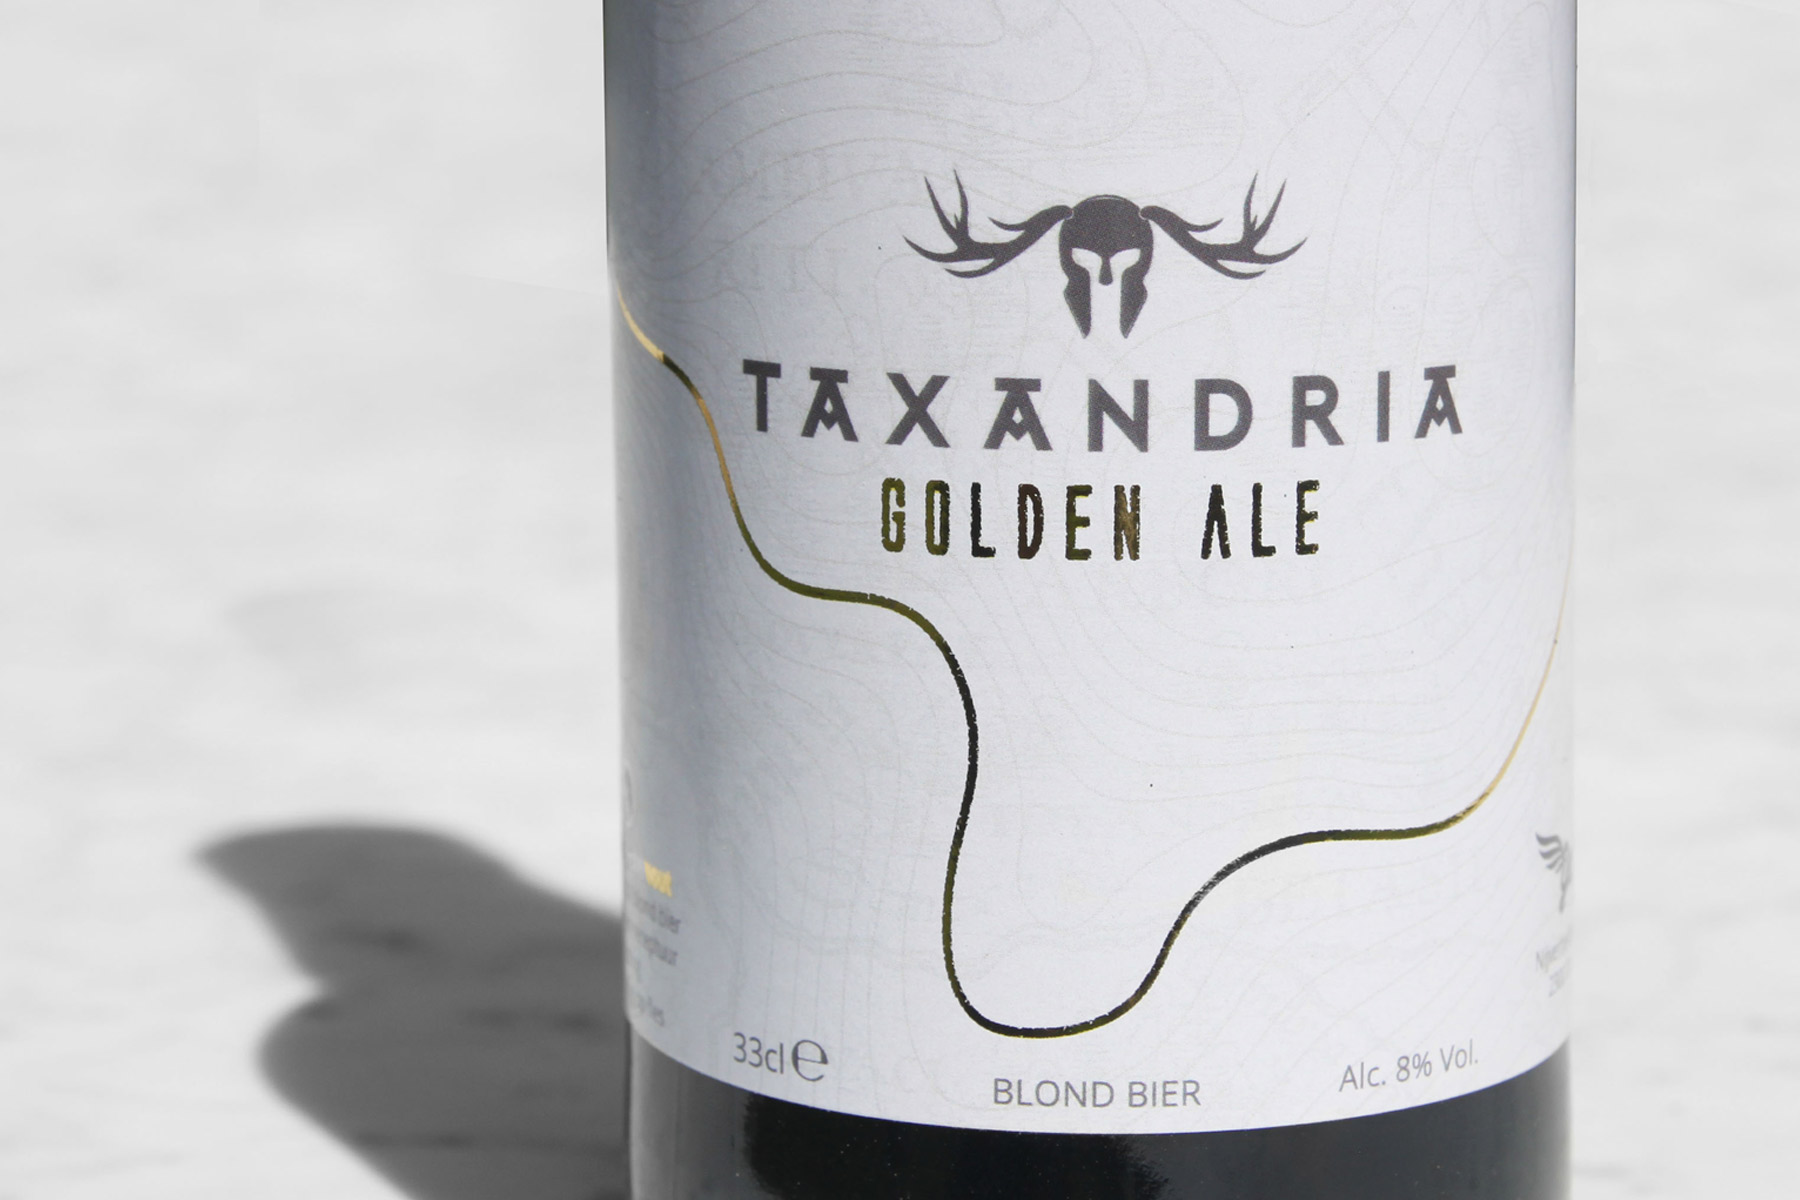 taxandria-bier-fles-1800×1200